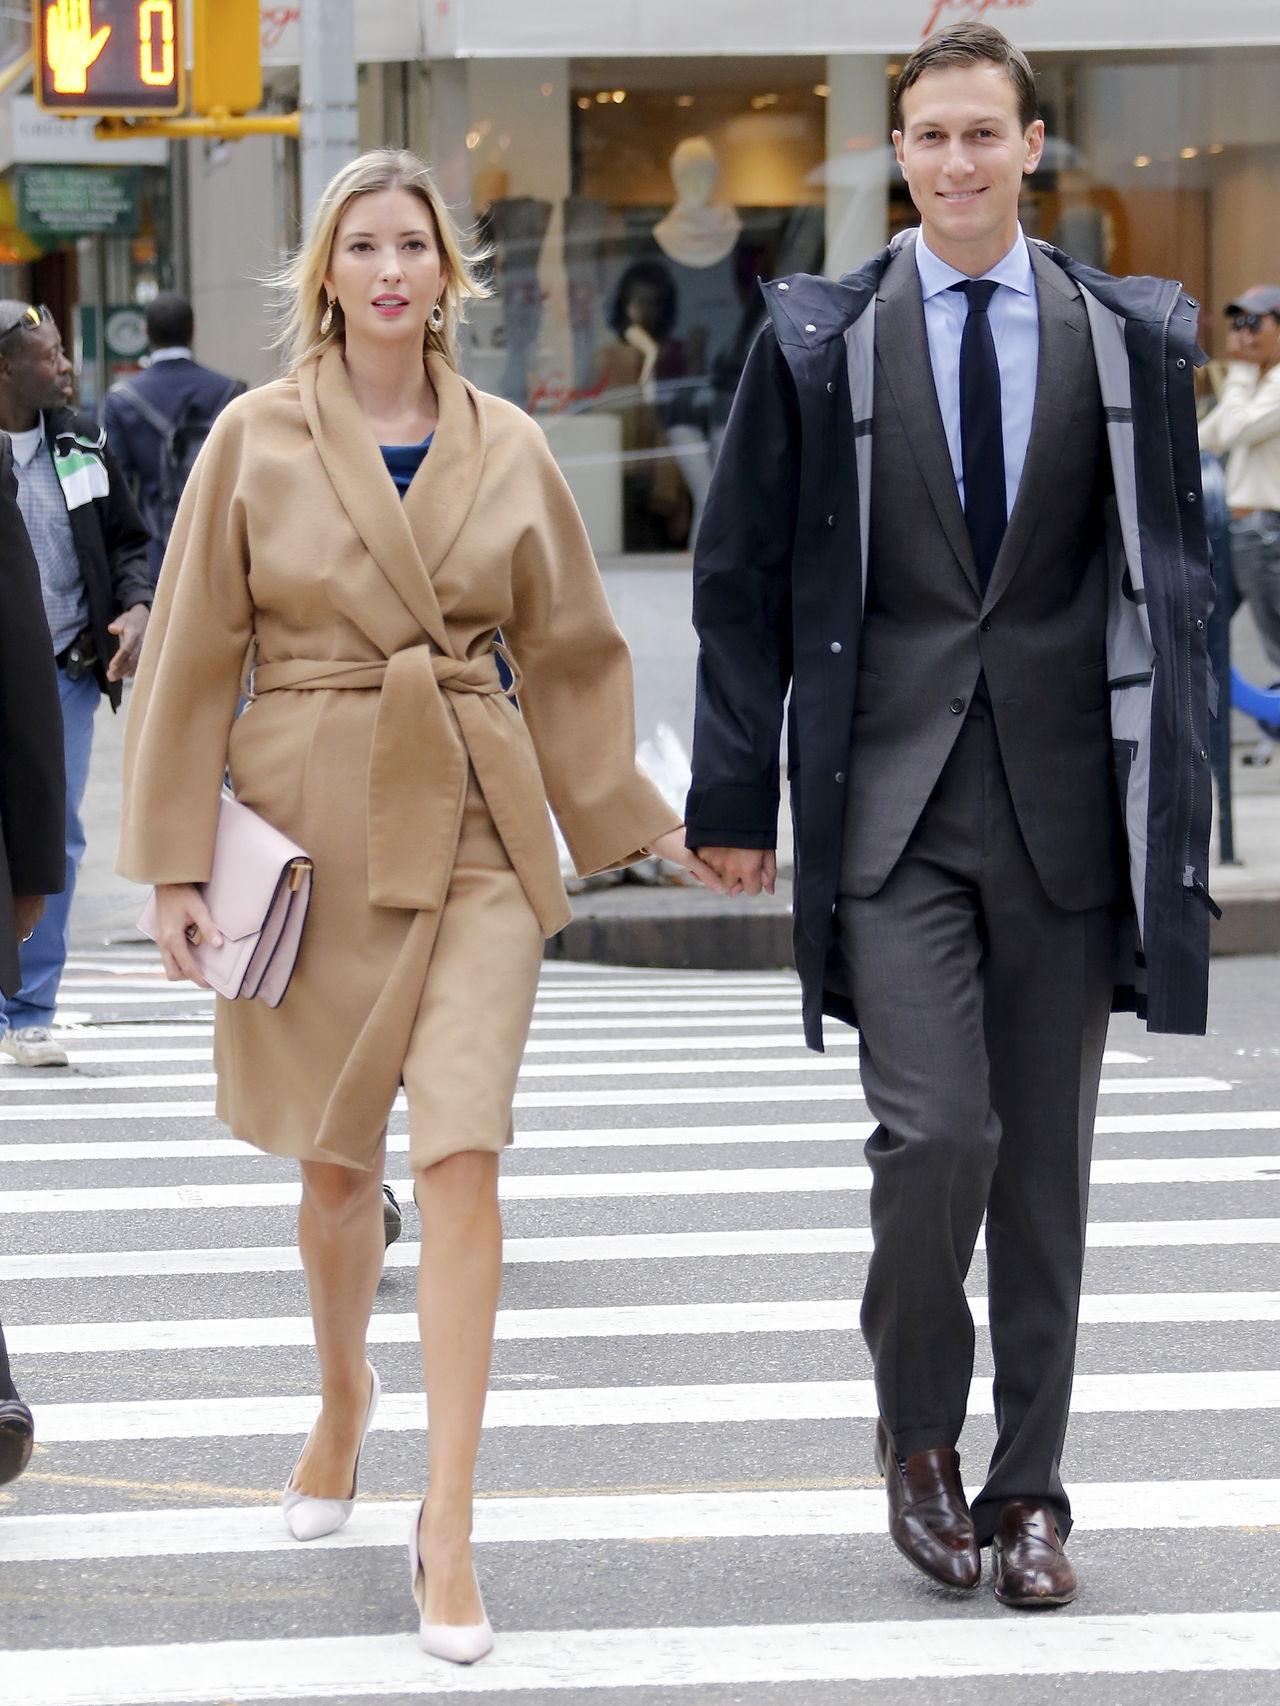 La hija de Donald Trump con su marido Jared Kushner